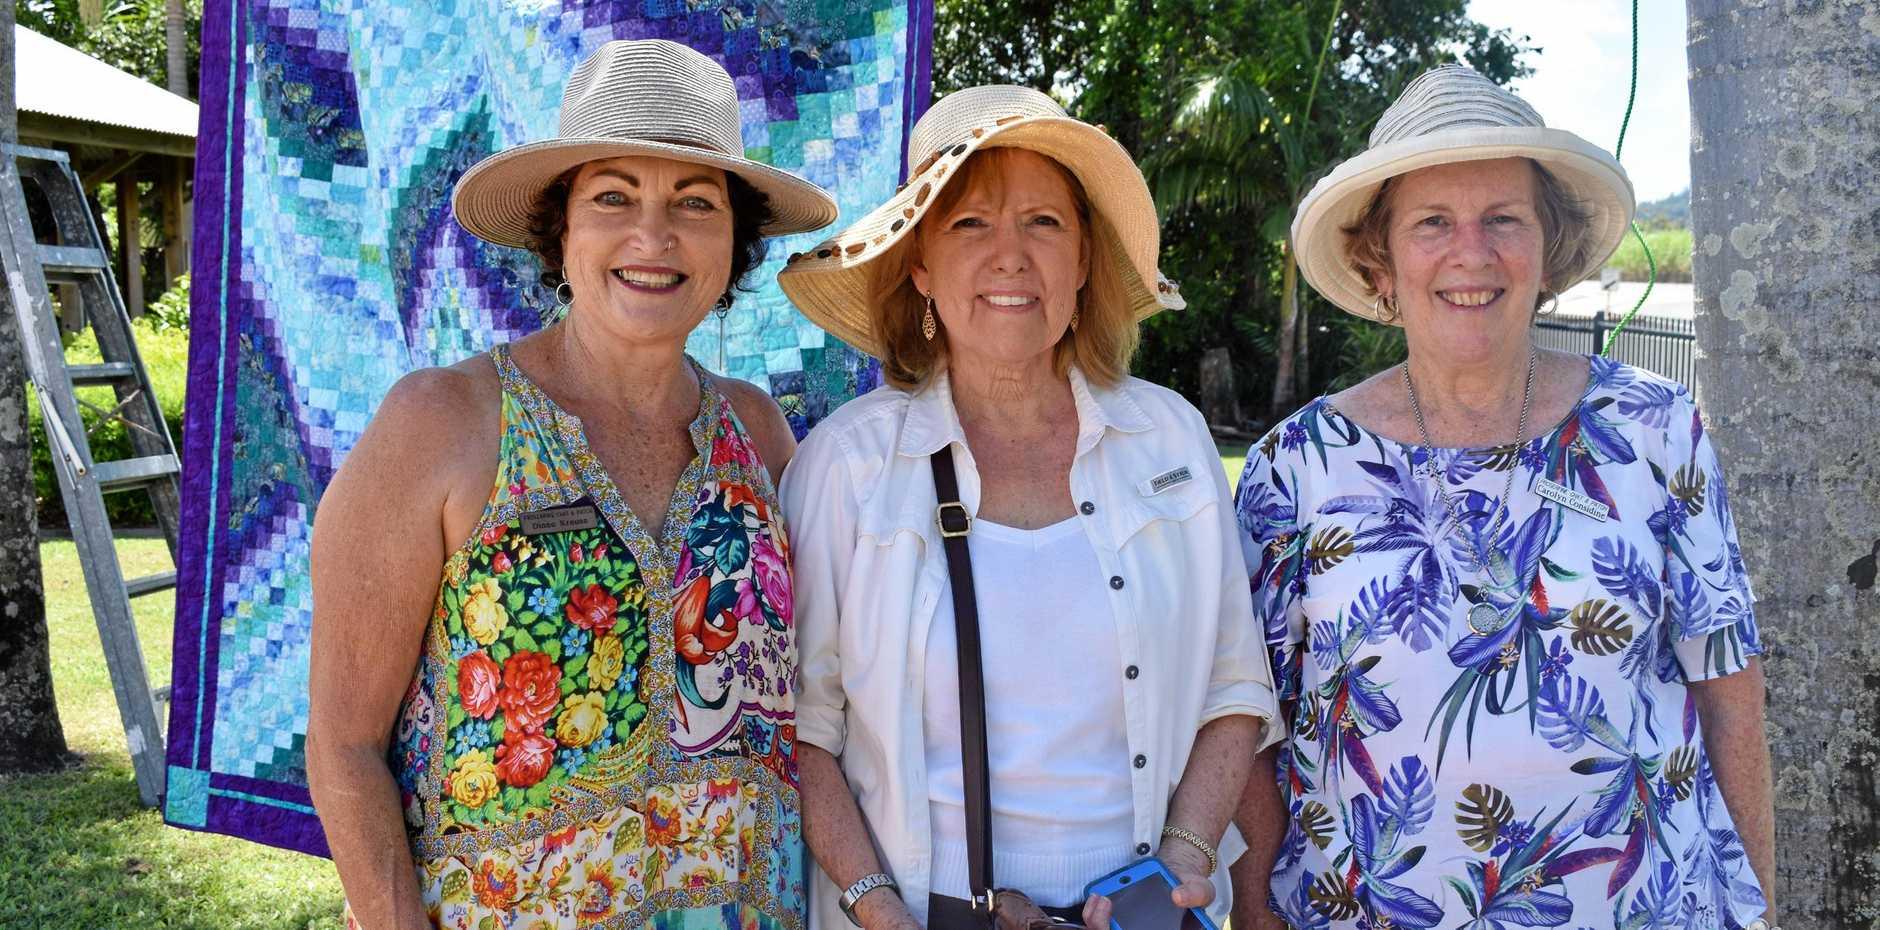 Diane Krause, Sharon Brower from South Texas and Caroline Considine.